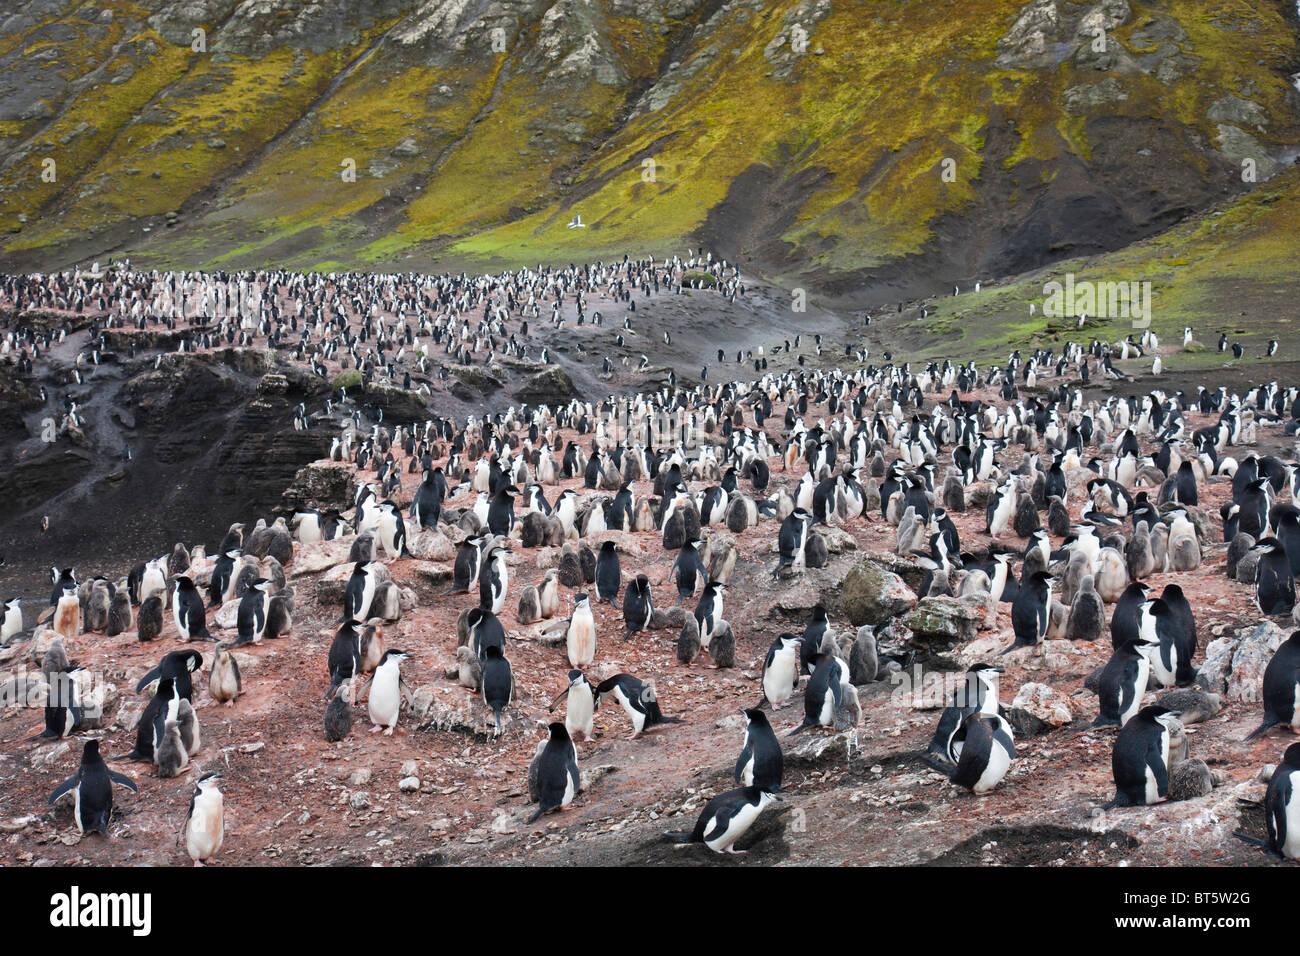 Chinstrap penguin colony, Deception Island, Antarctica. - Stock Image